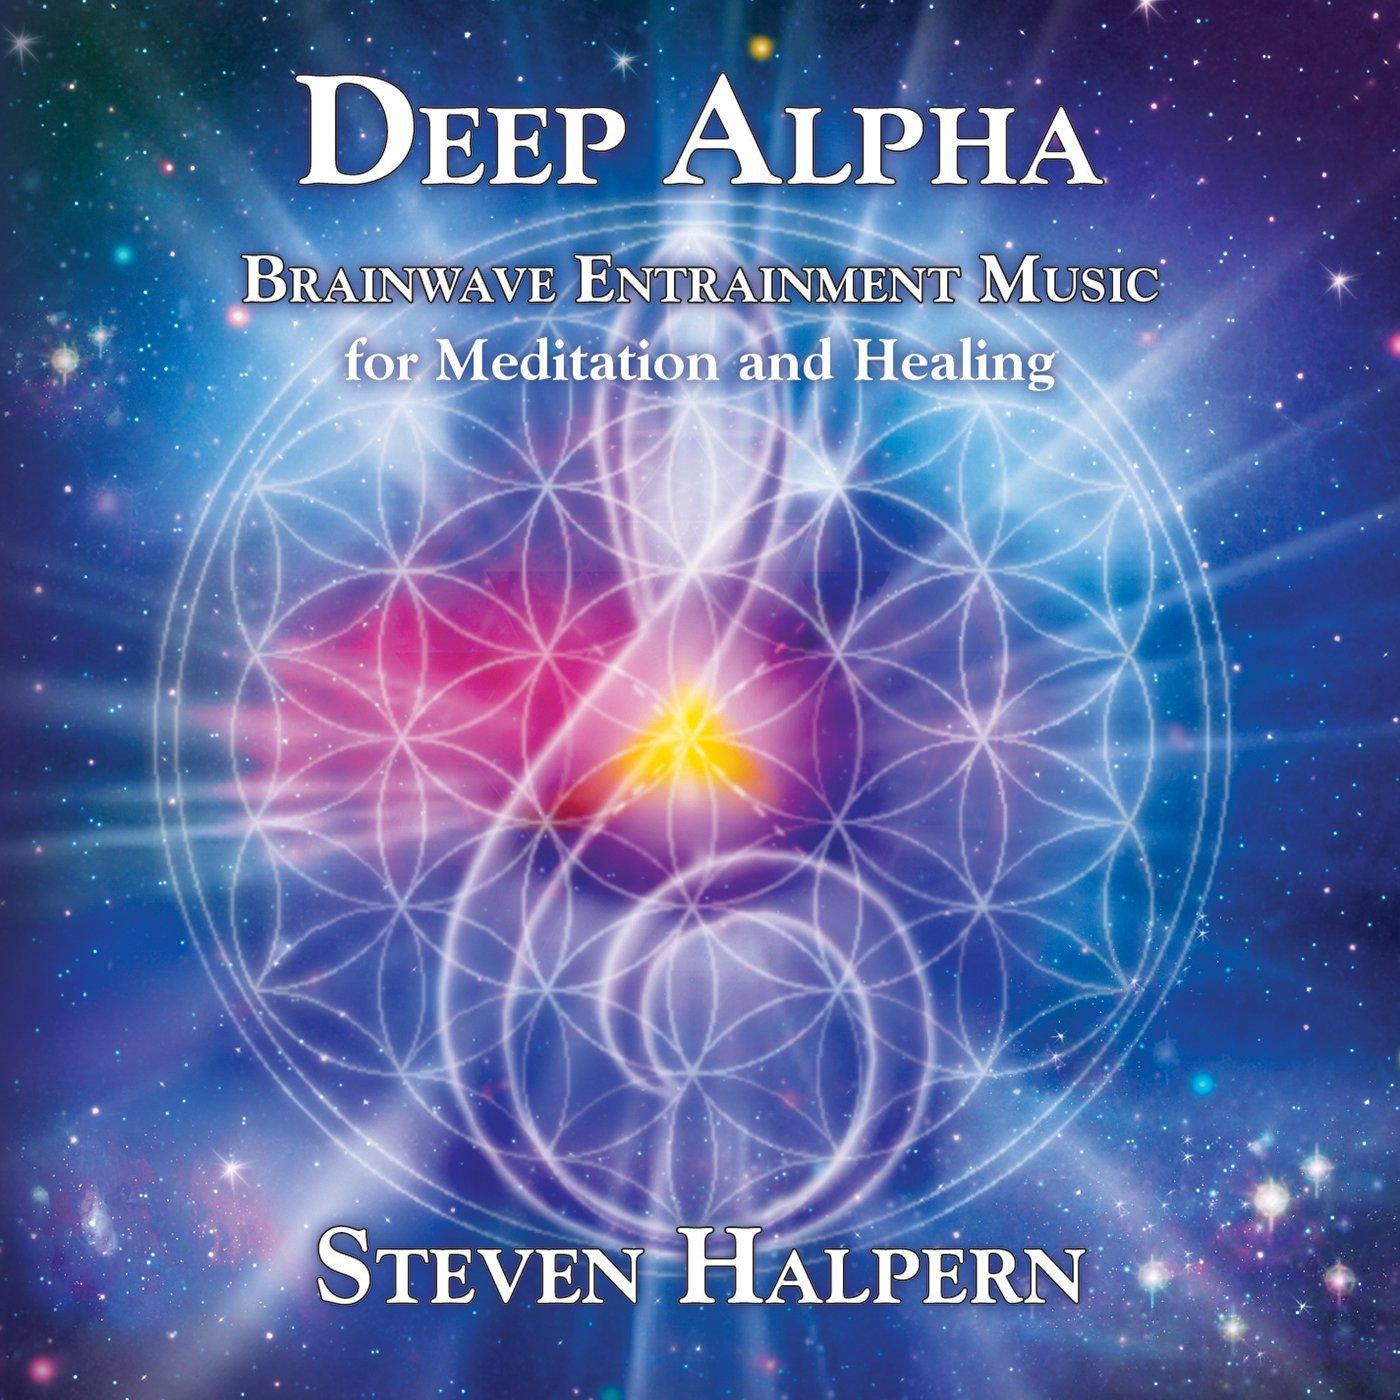 Deep Alpha: Brainwave Entrainment Music for Meditation and Healing